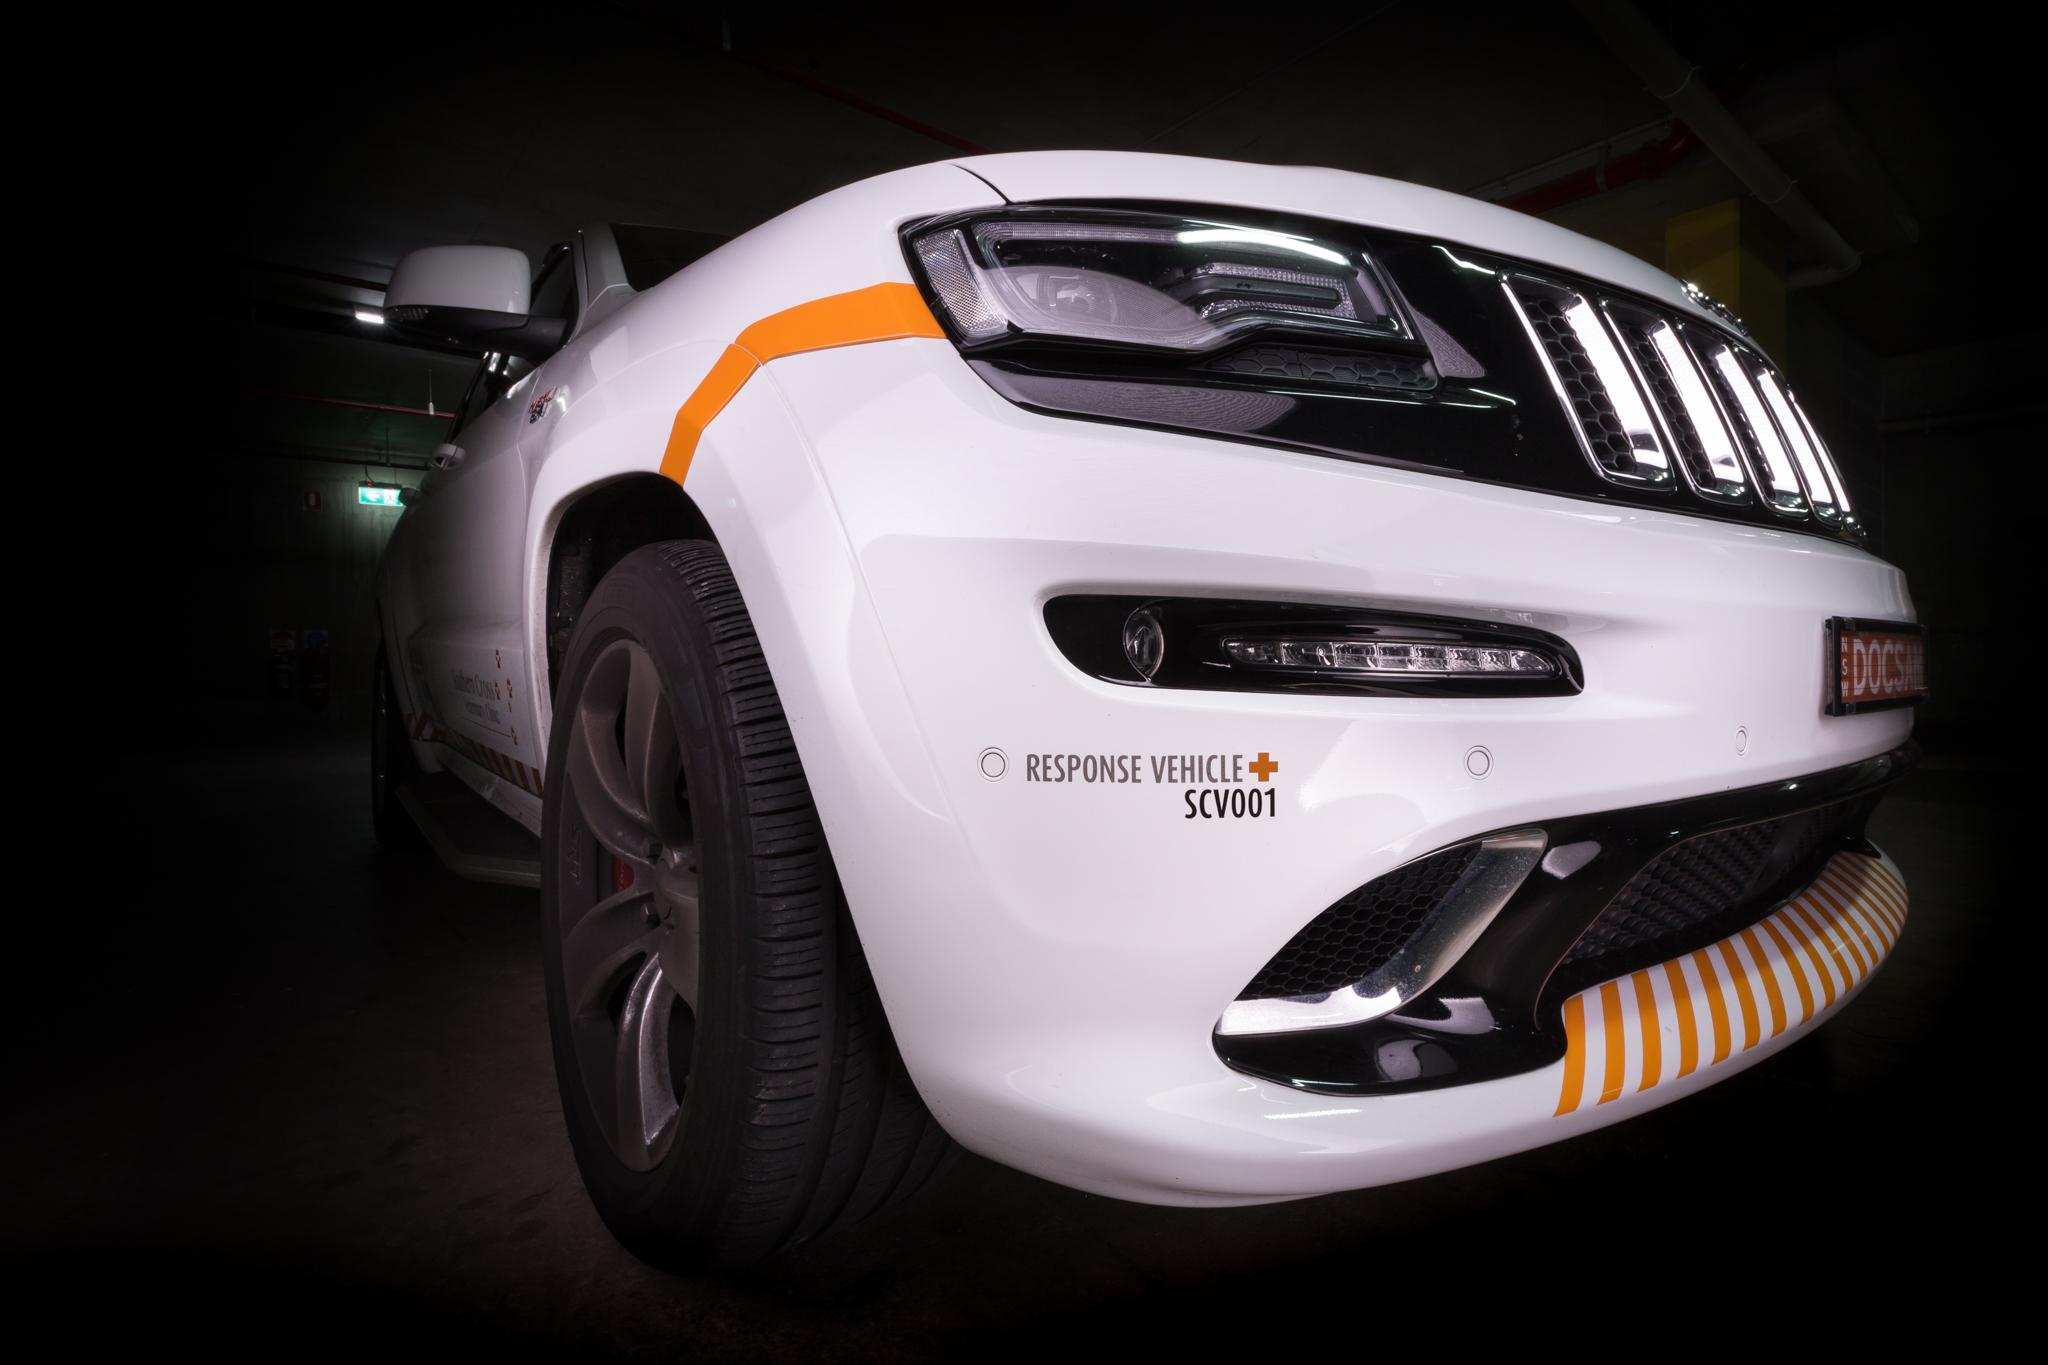 Southern Cross Vet Response Vehicle Driving Lights, Jeep Grand Cherokee Car Photography